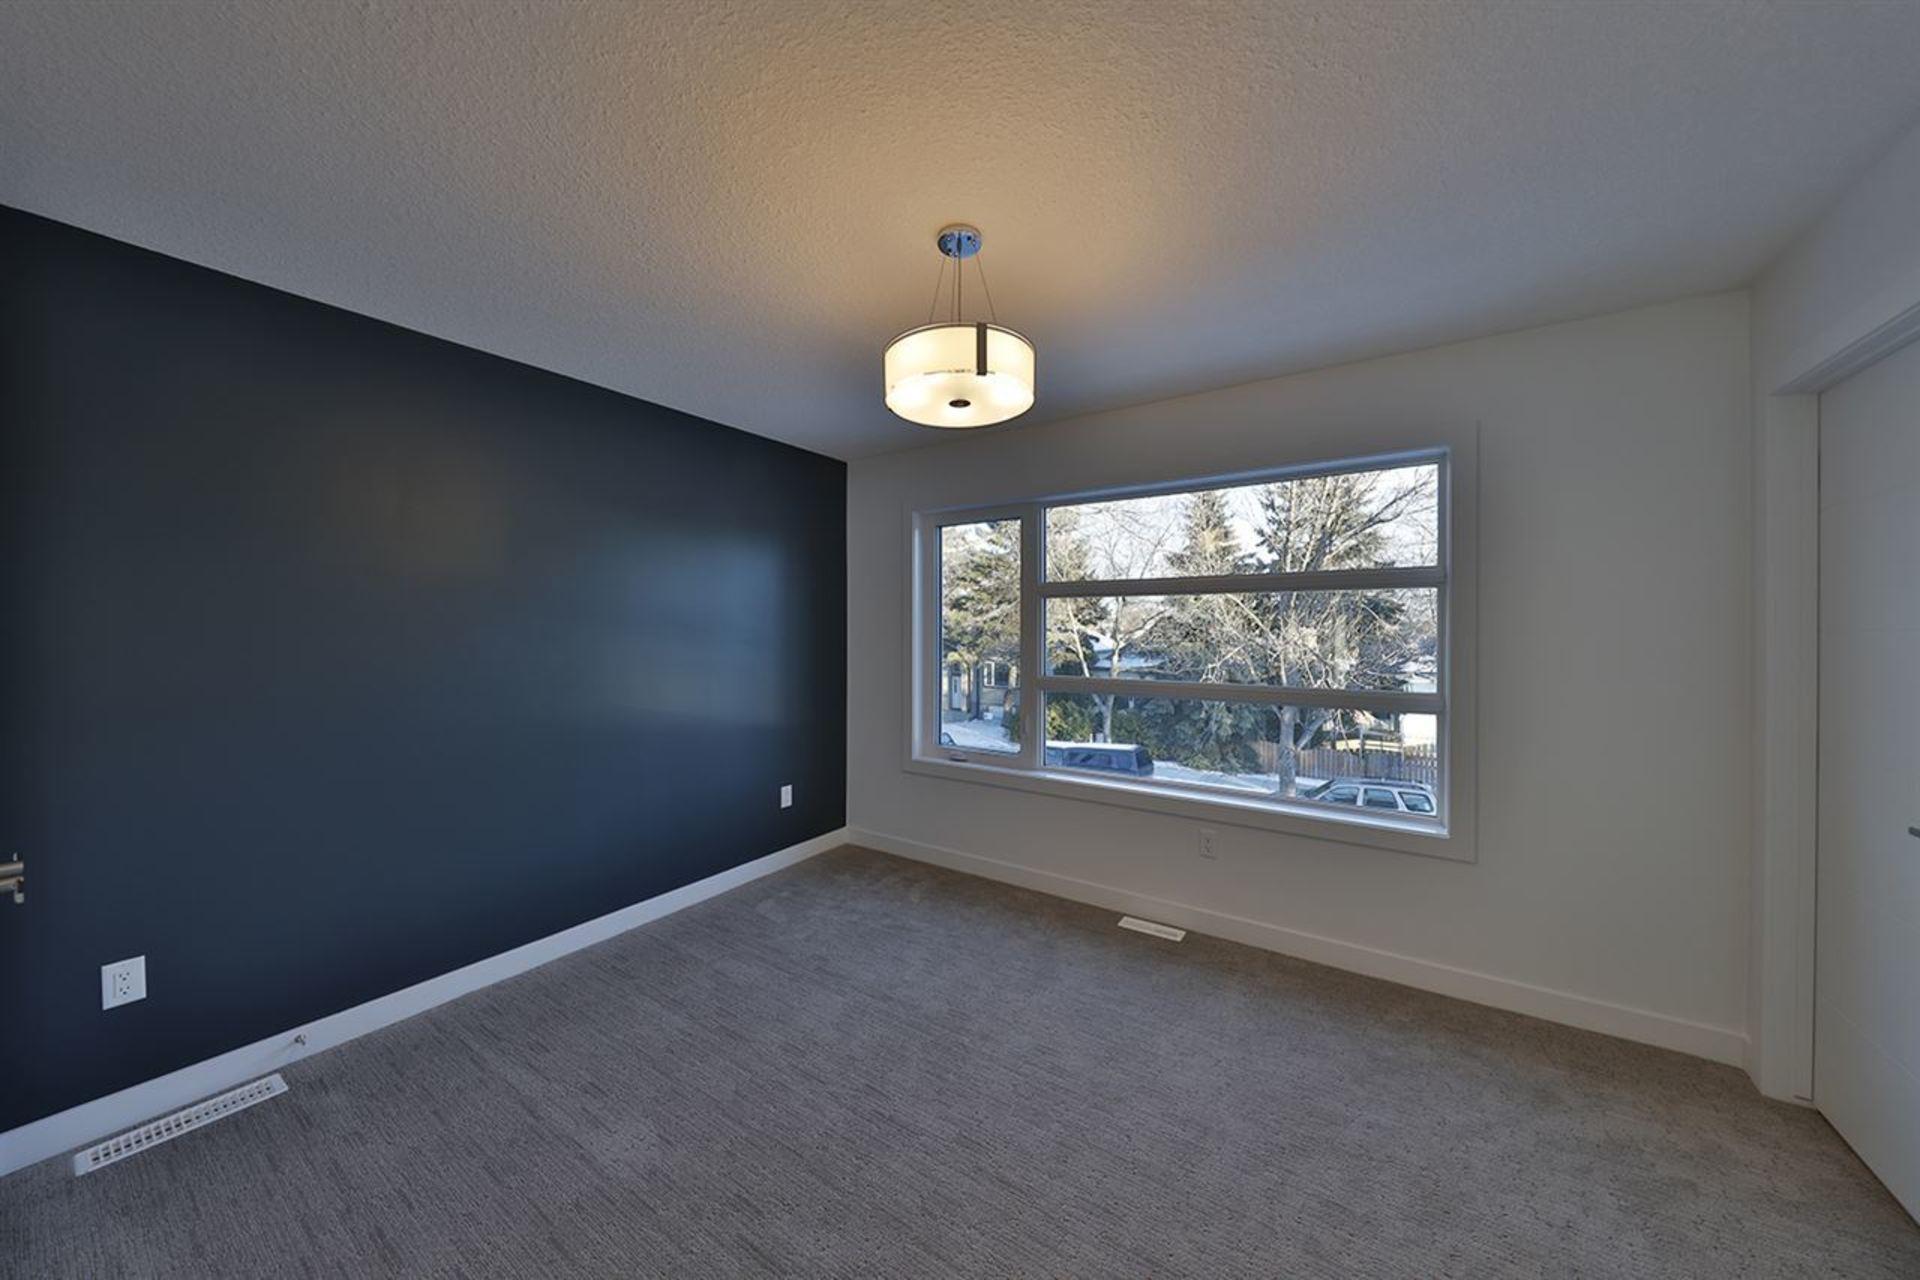 11636-84-street-parkdale_edmo-edmonton-14 at 11636 84 Street, Parkdale_EDMO, Edmonton